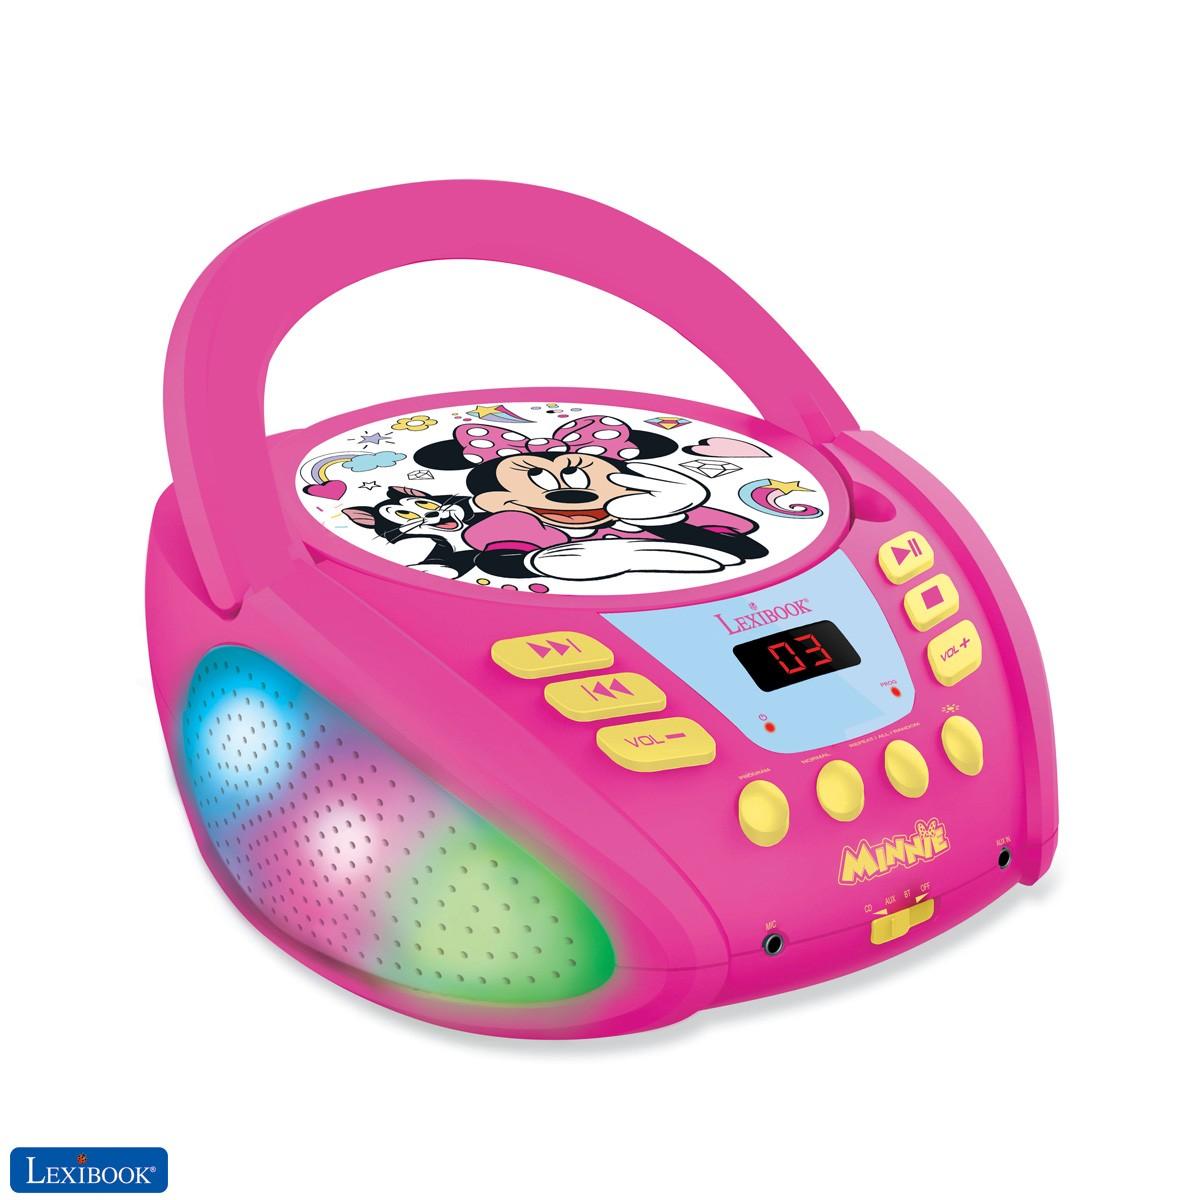 Disney Minnie - Bluetooth CD player for kids